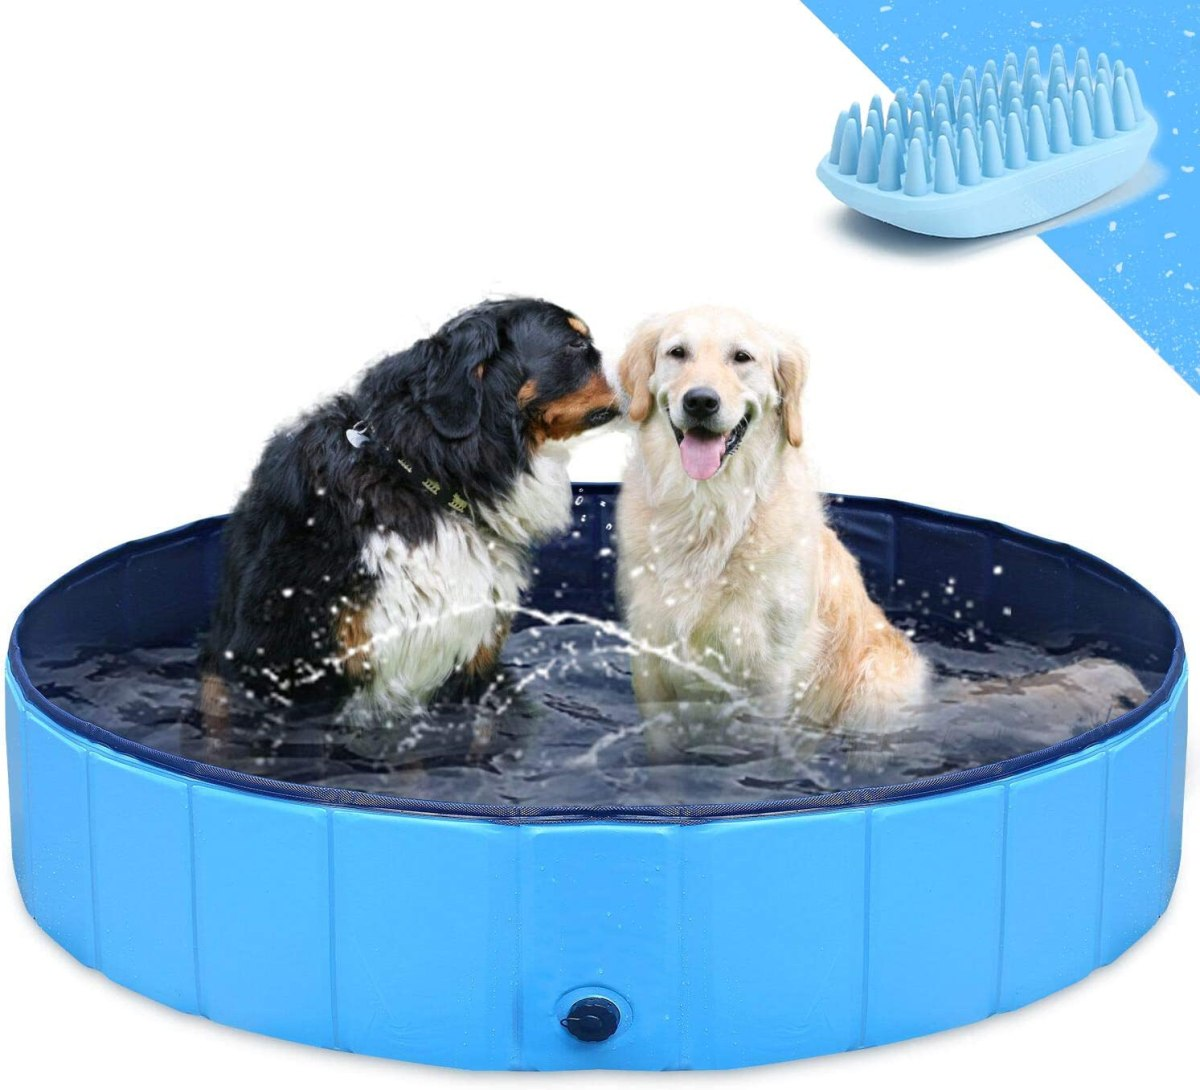 Piscina para Perros Plegable Mascota Piscina portátil